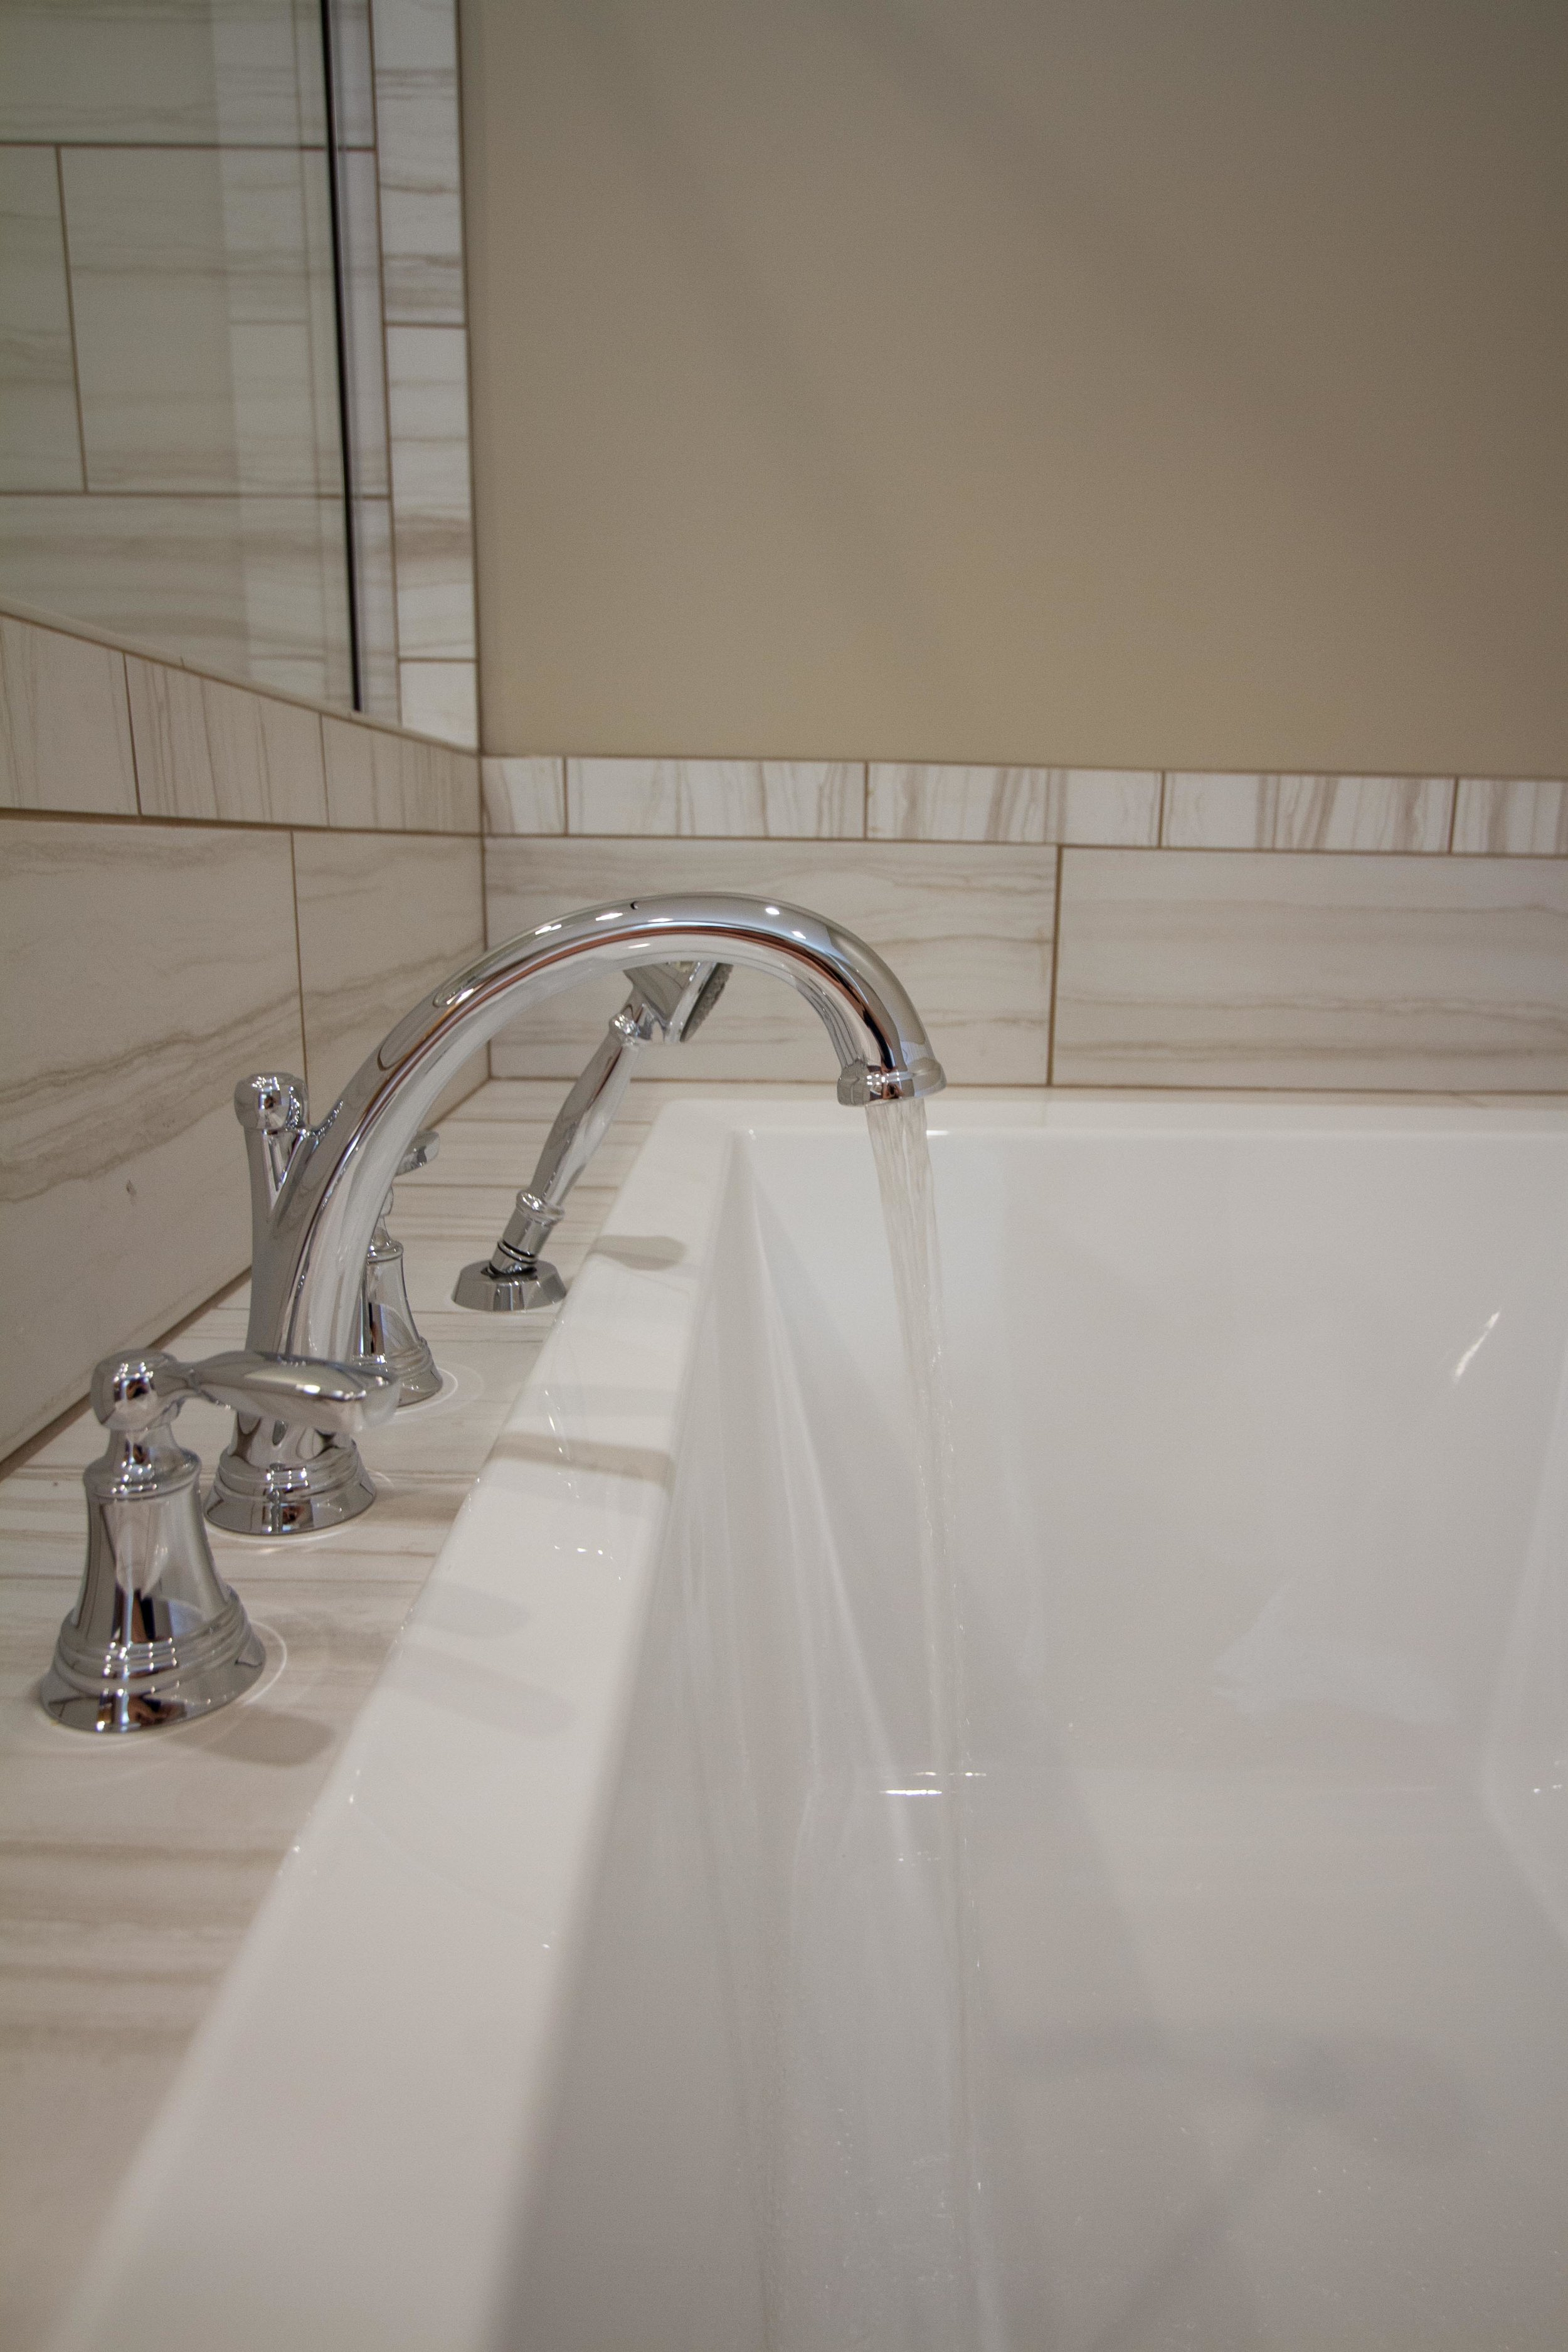 Next_Step_Homes-Master-Bathroom-2.jpg